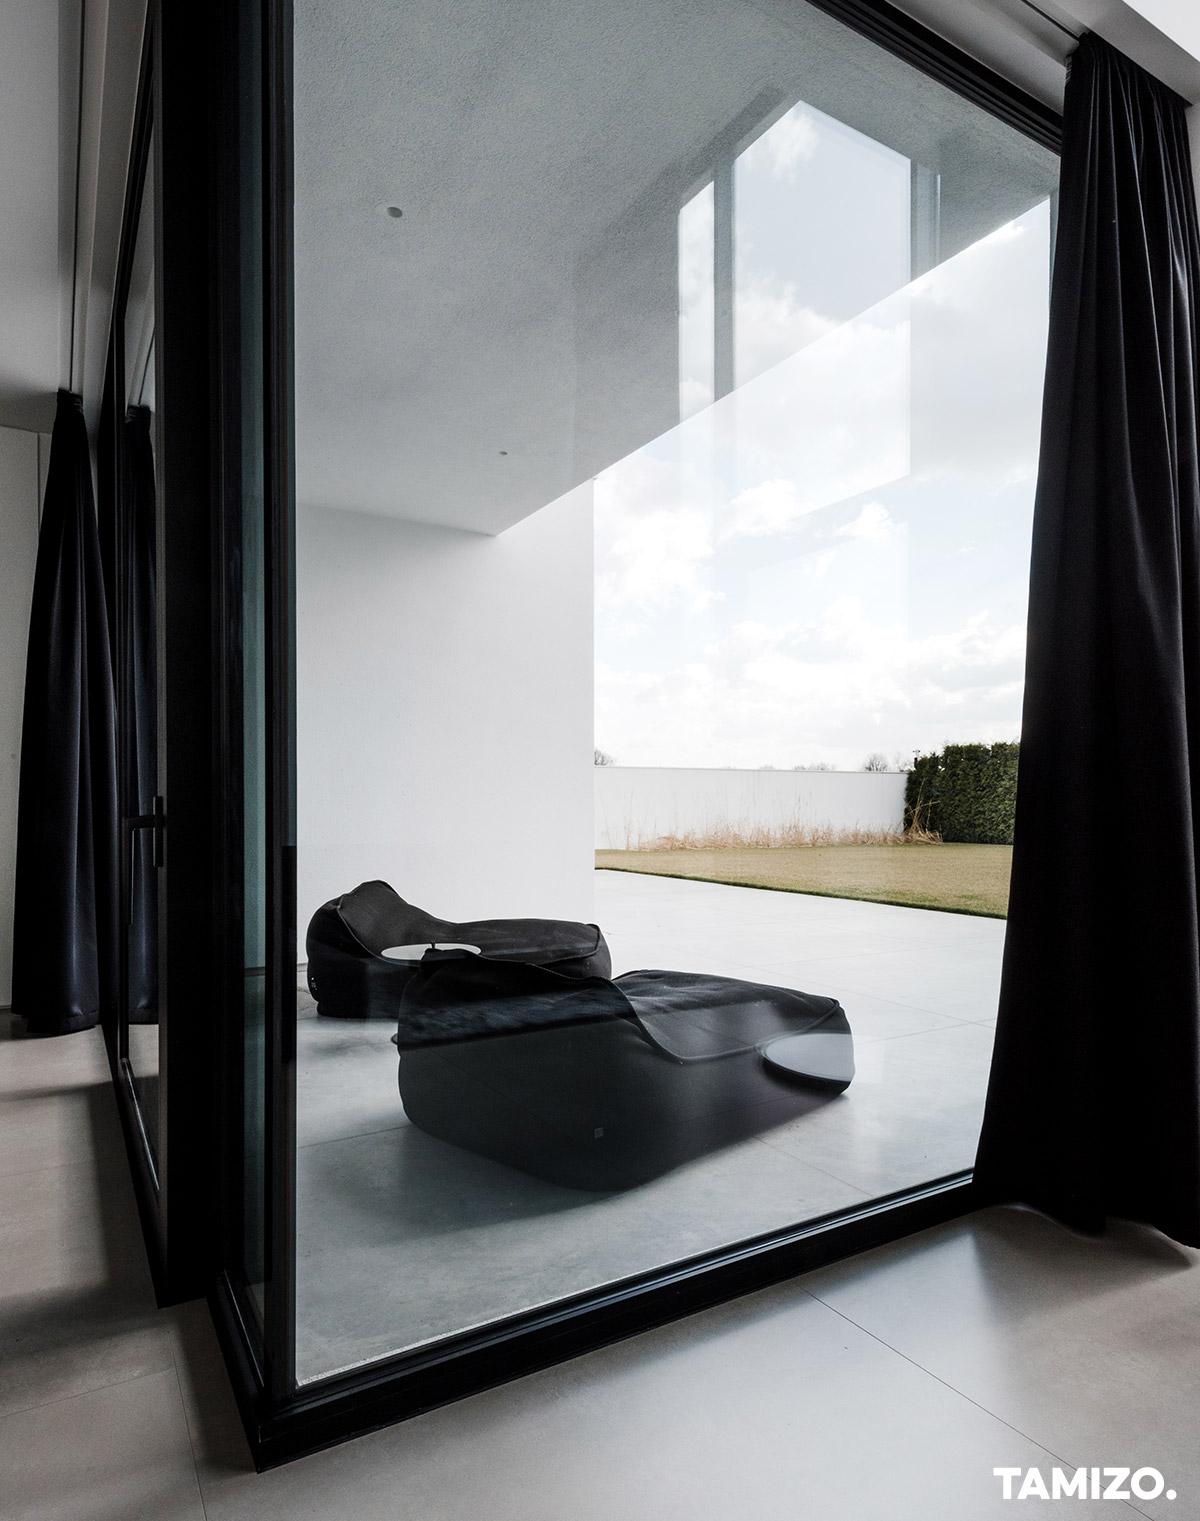 012_tamizo_architects_interior_house_realization_warsaw_poland_26